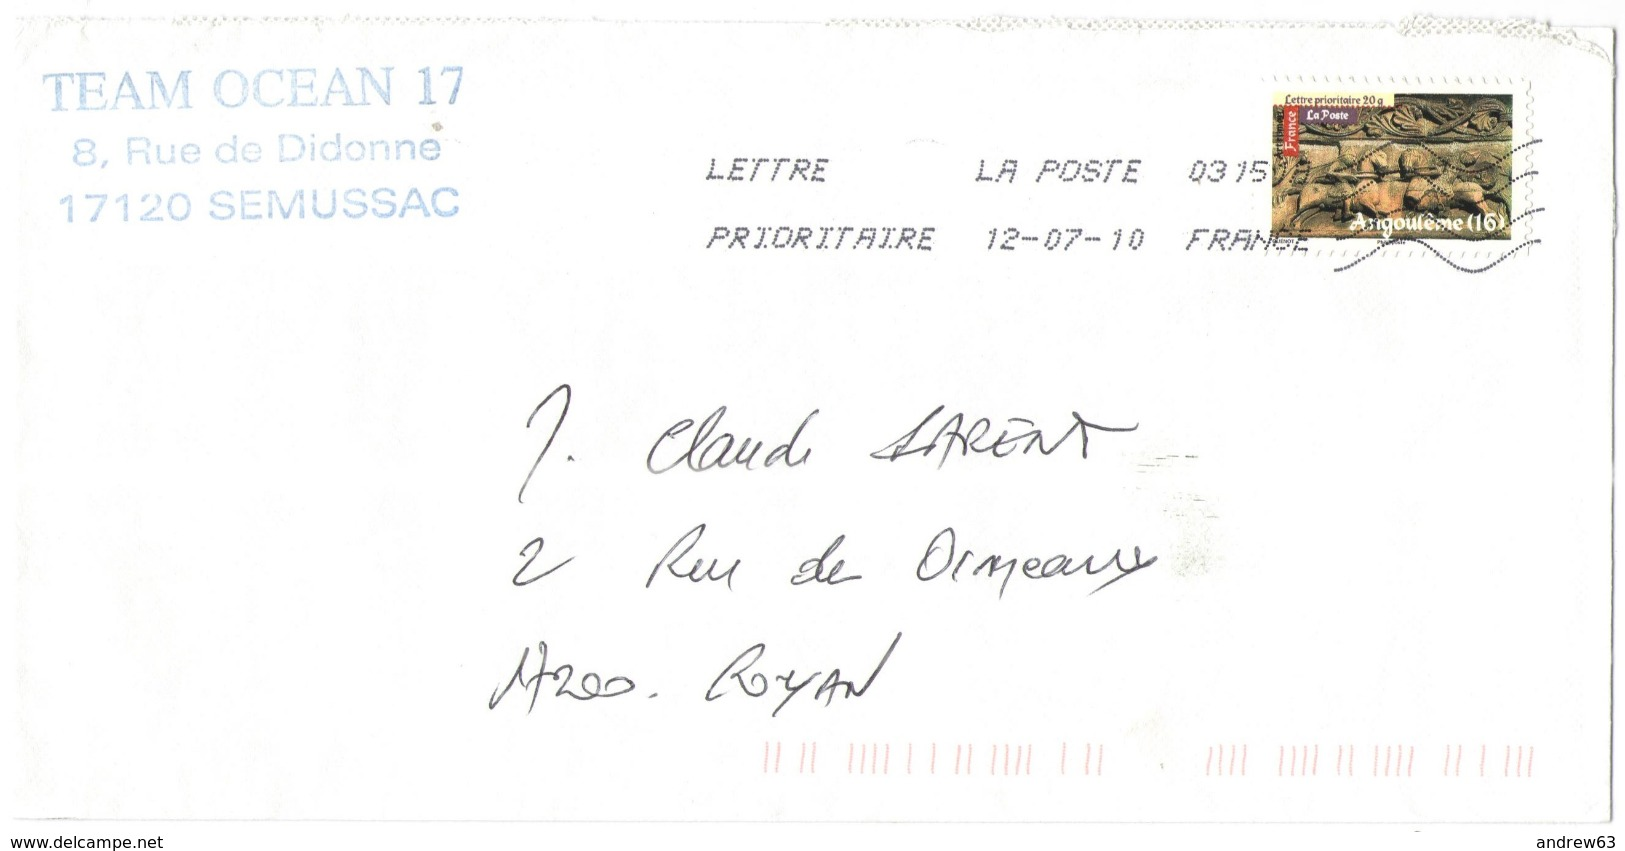 FRANCIA - France - 2010 - Lettre Prioritaire 20g Art Roman Angoulême (16) - Viaggiata Da 03151A Per Royan, France - Francia